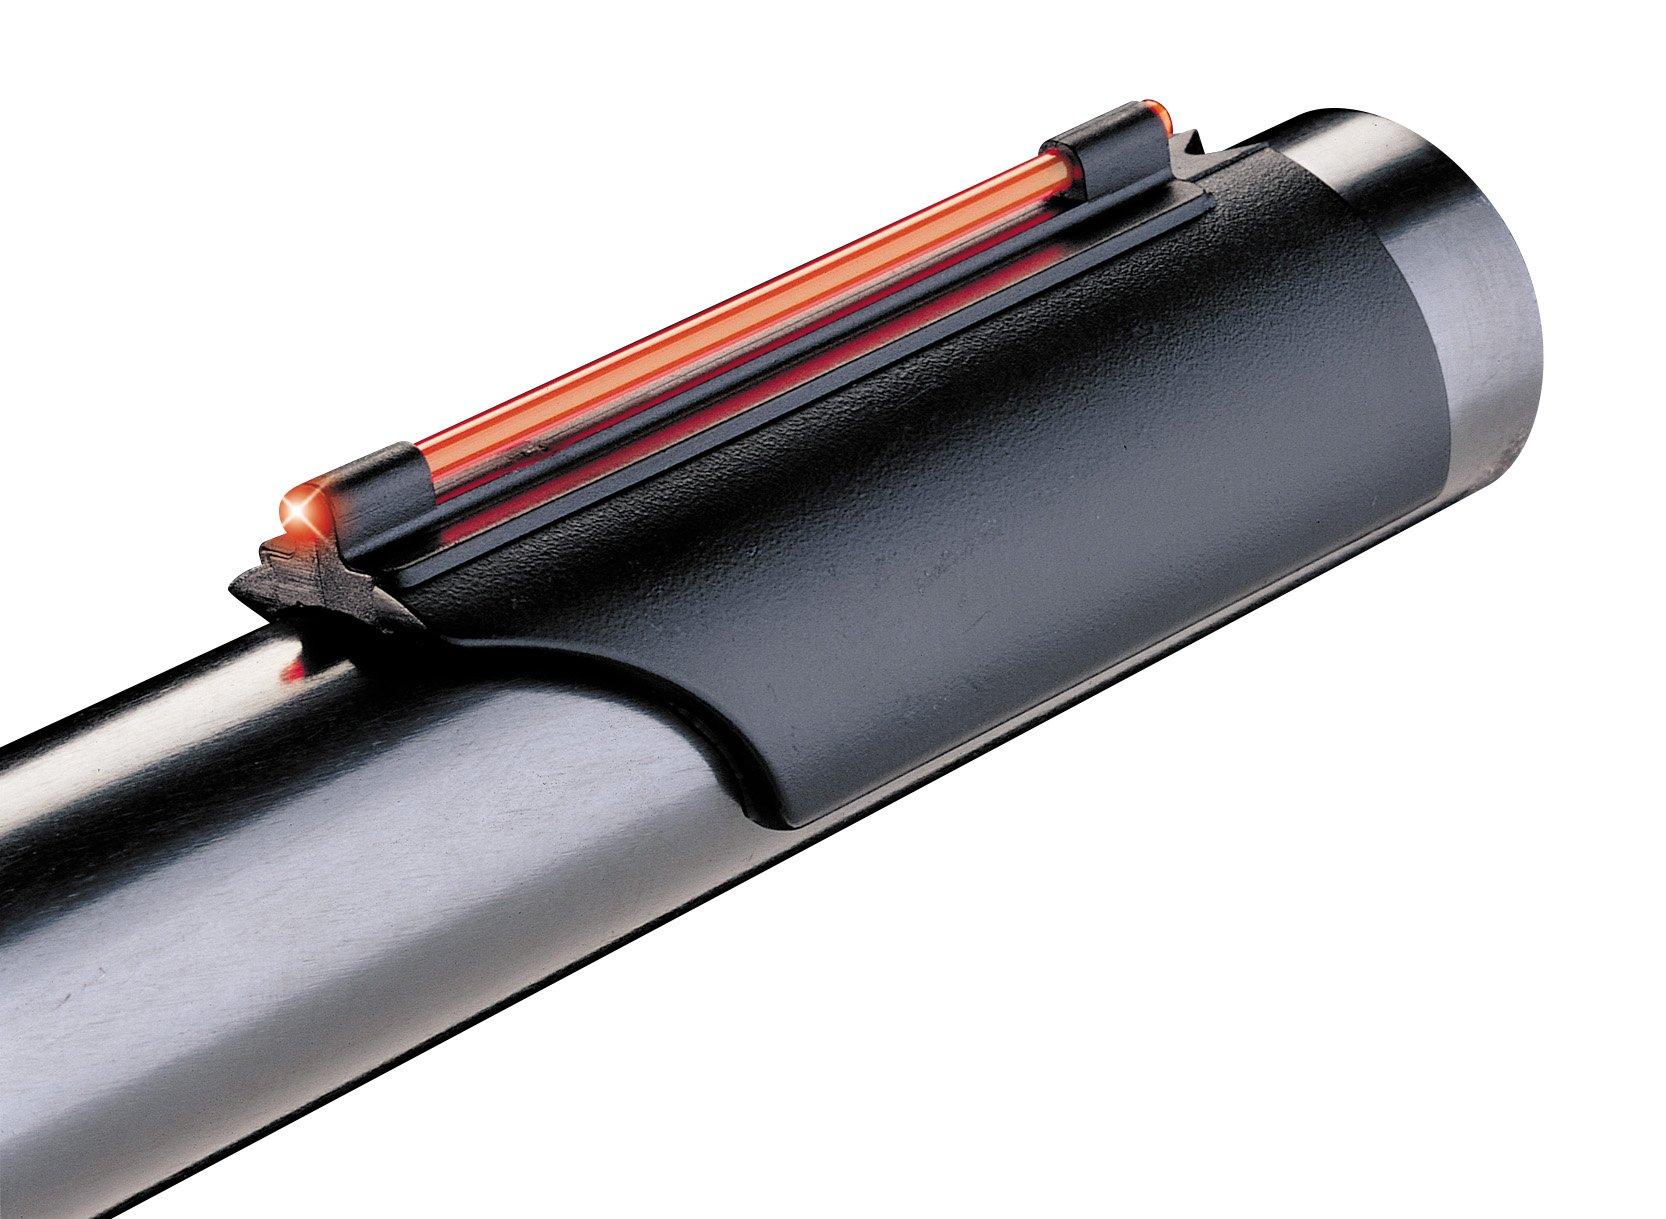 TRUGLO Fiber-Optic Universal Shotgun Front Sight, Red by TRUGLO